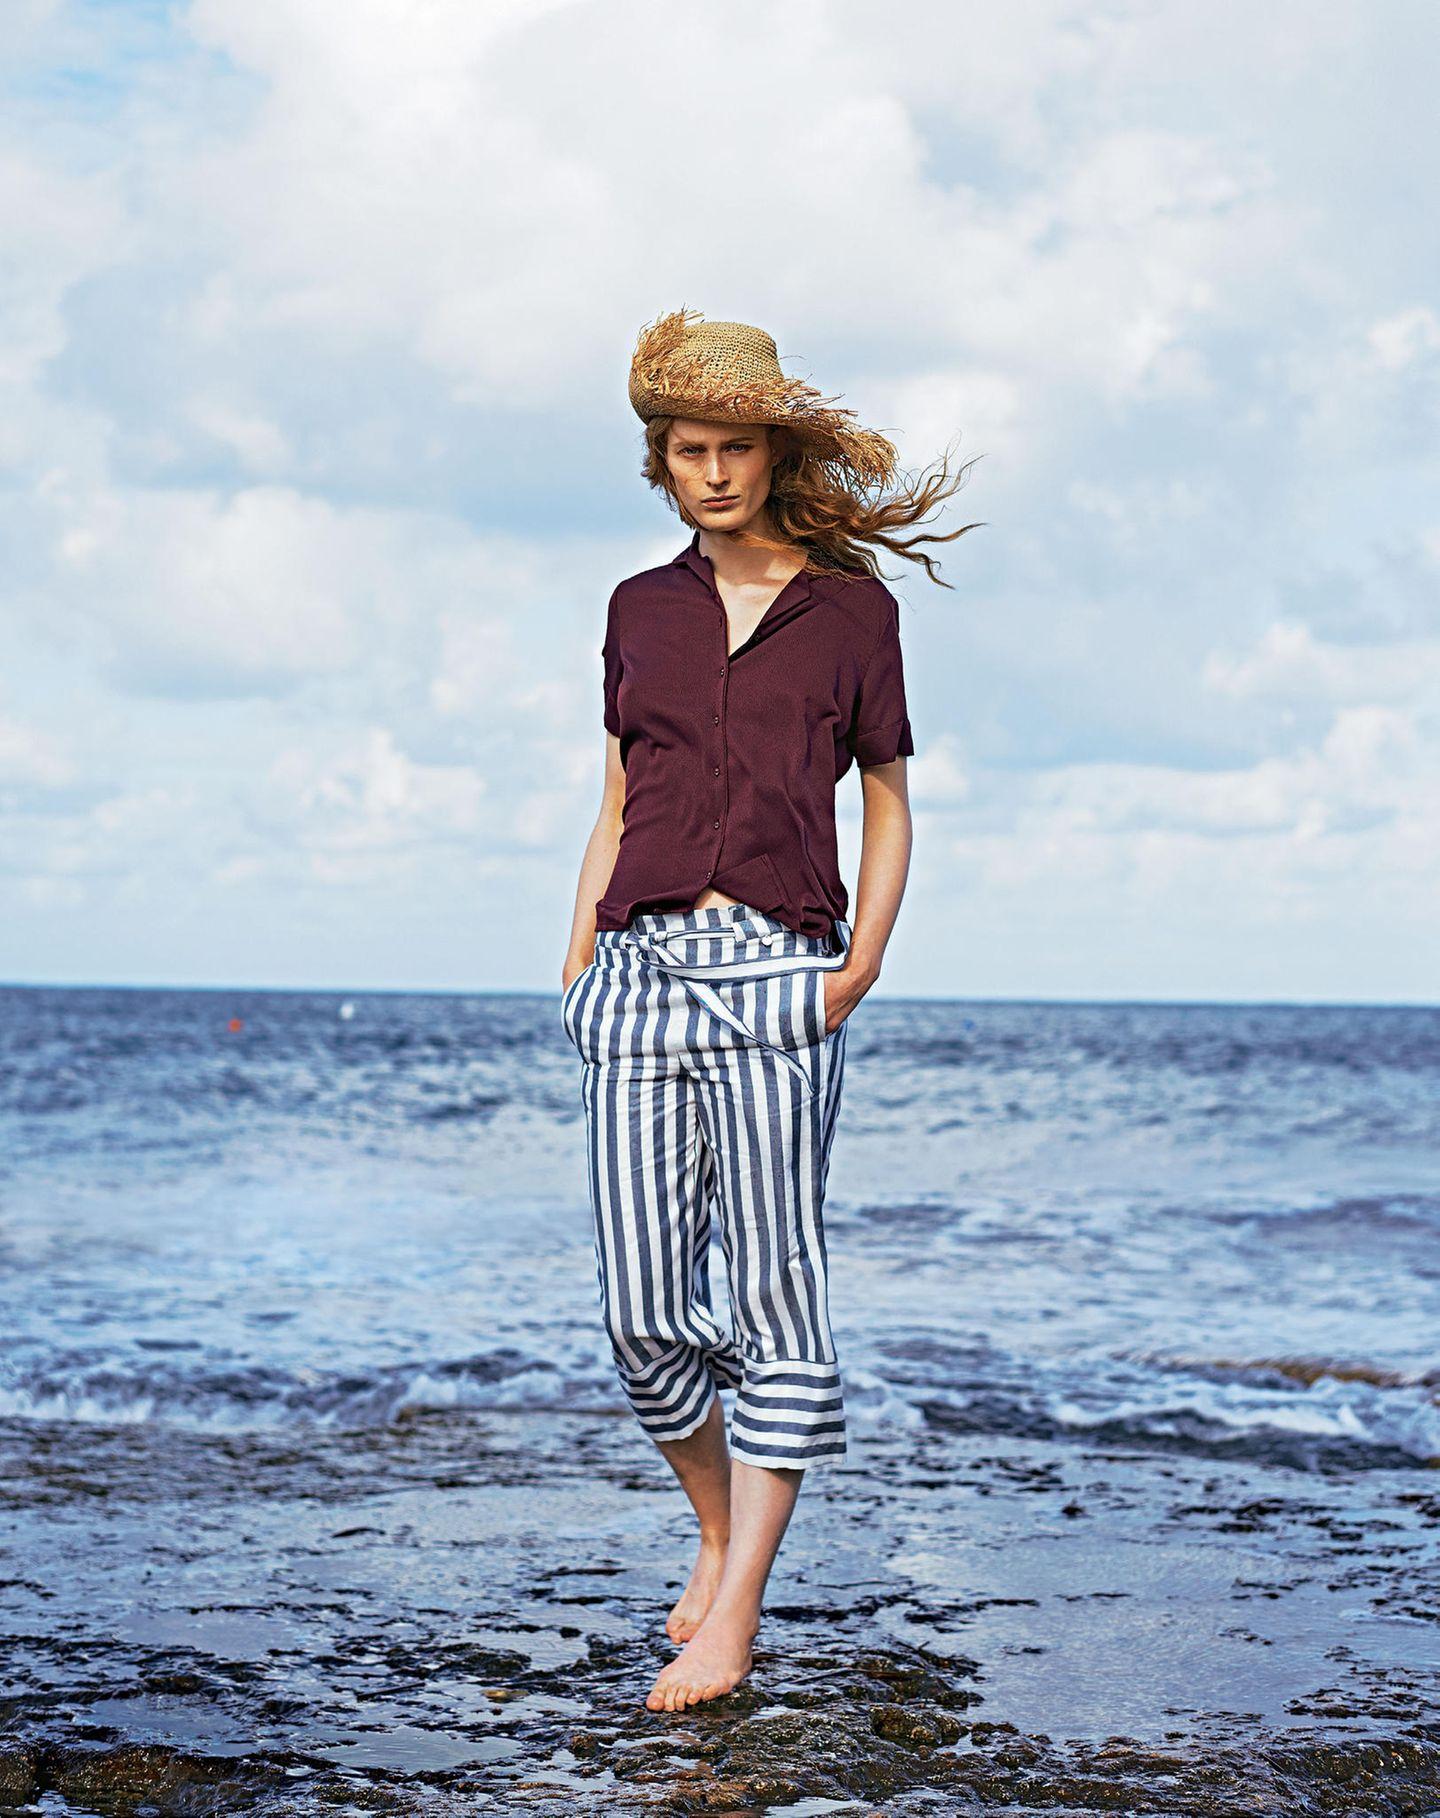 French Chic: Model Baumwollbluse und maritimer Culotte